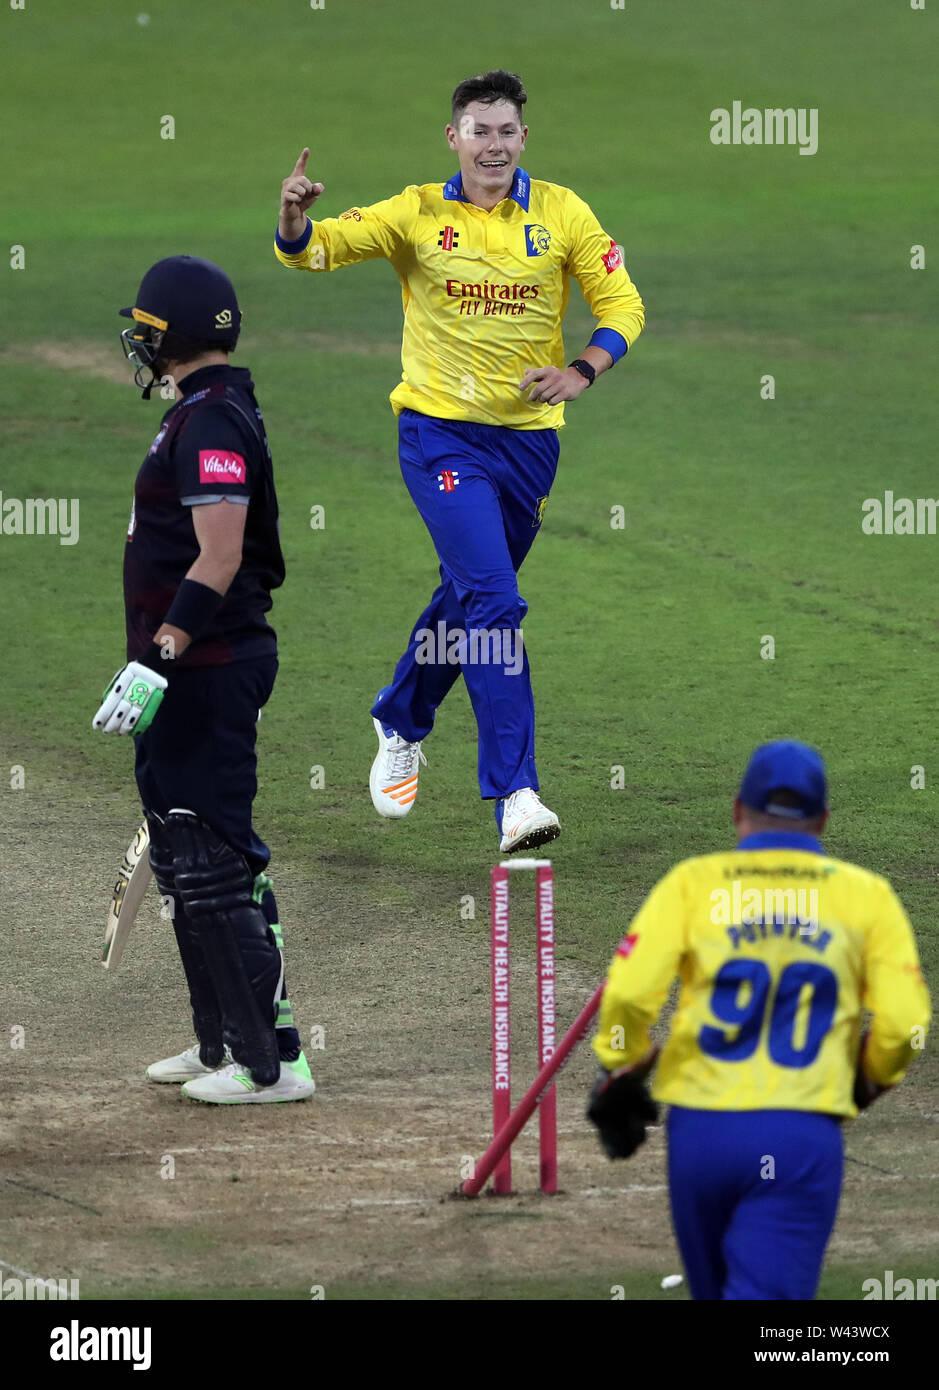 Durham's Matthew Potts, top, celebrates bowling out Northamptonshire's Josh Cobb during the Vitality Blast T20 match at Emirates Riverside, Durham. - Stock Image